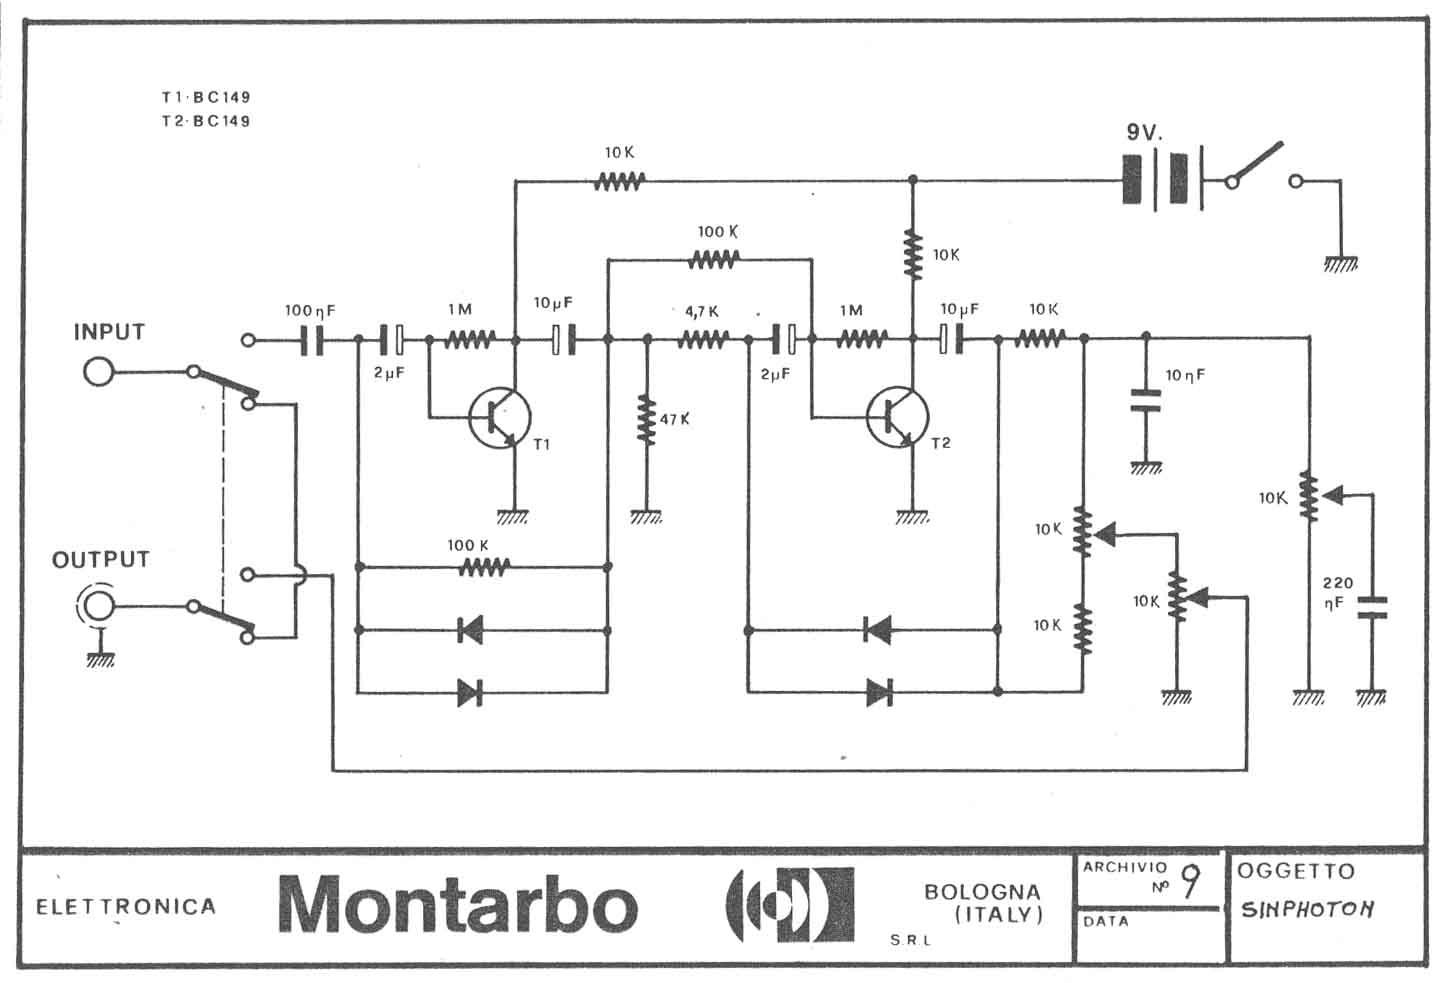 Schemi Elettrici Ne : Montarbo sinphoton